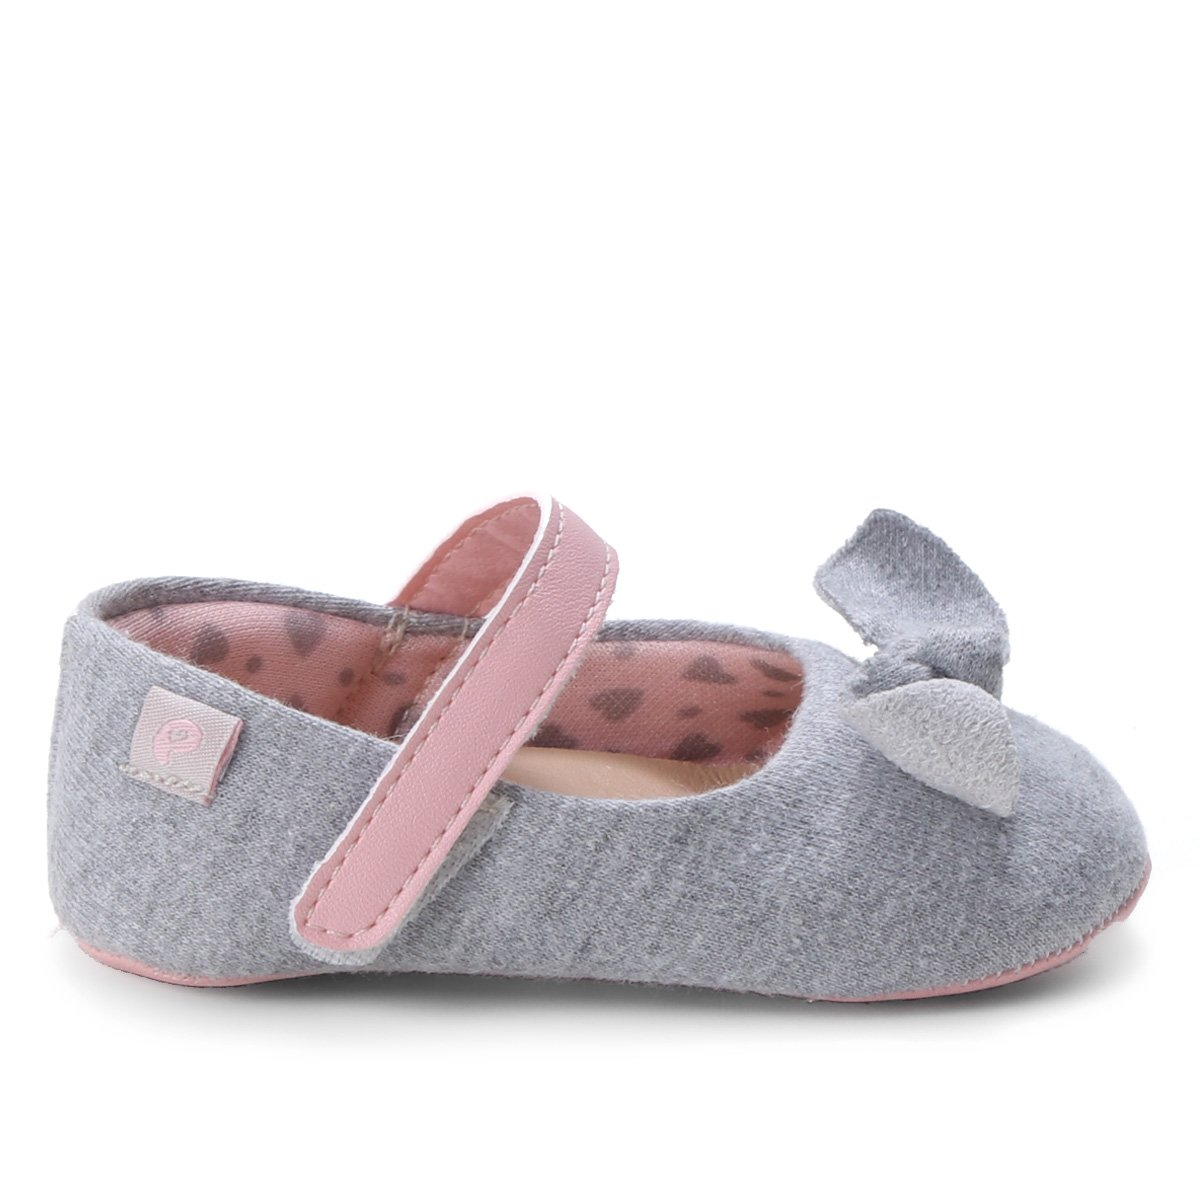 Sapato Bebê Pampili Nina Malha Antiviral Feminino